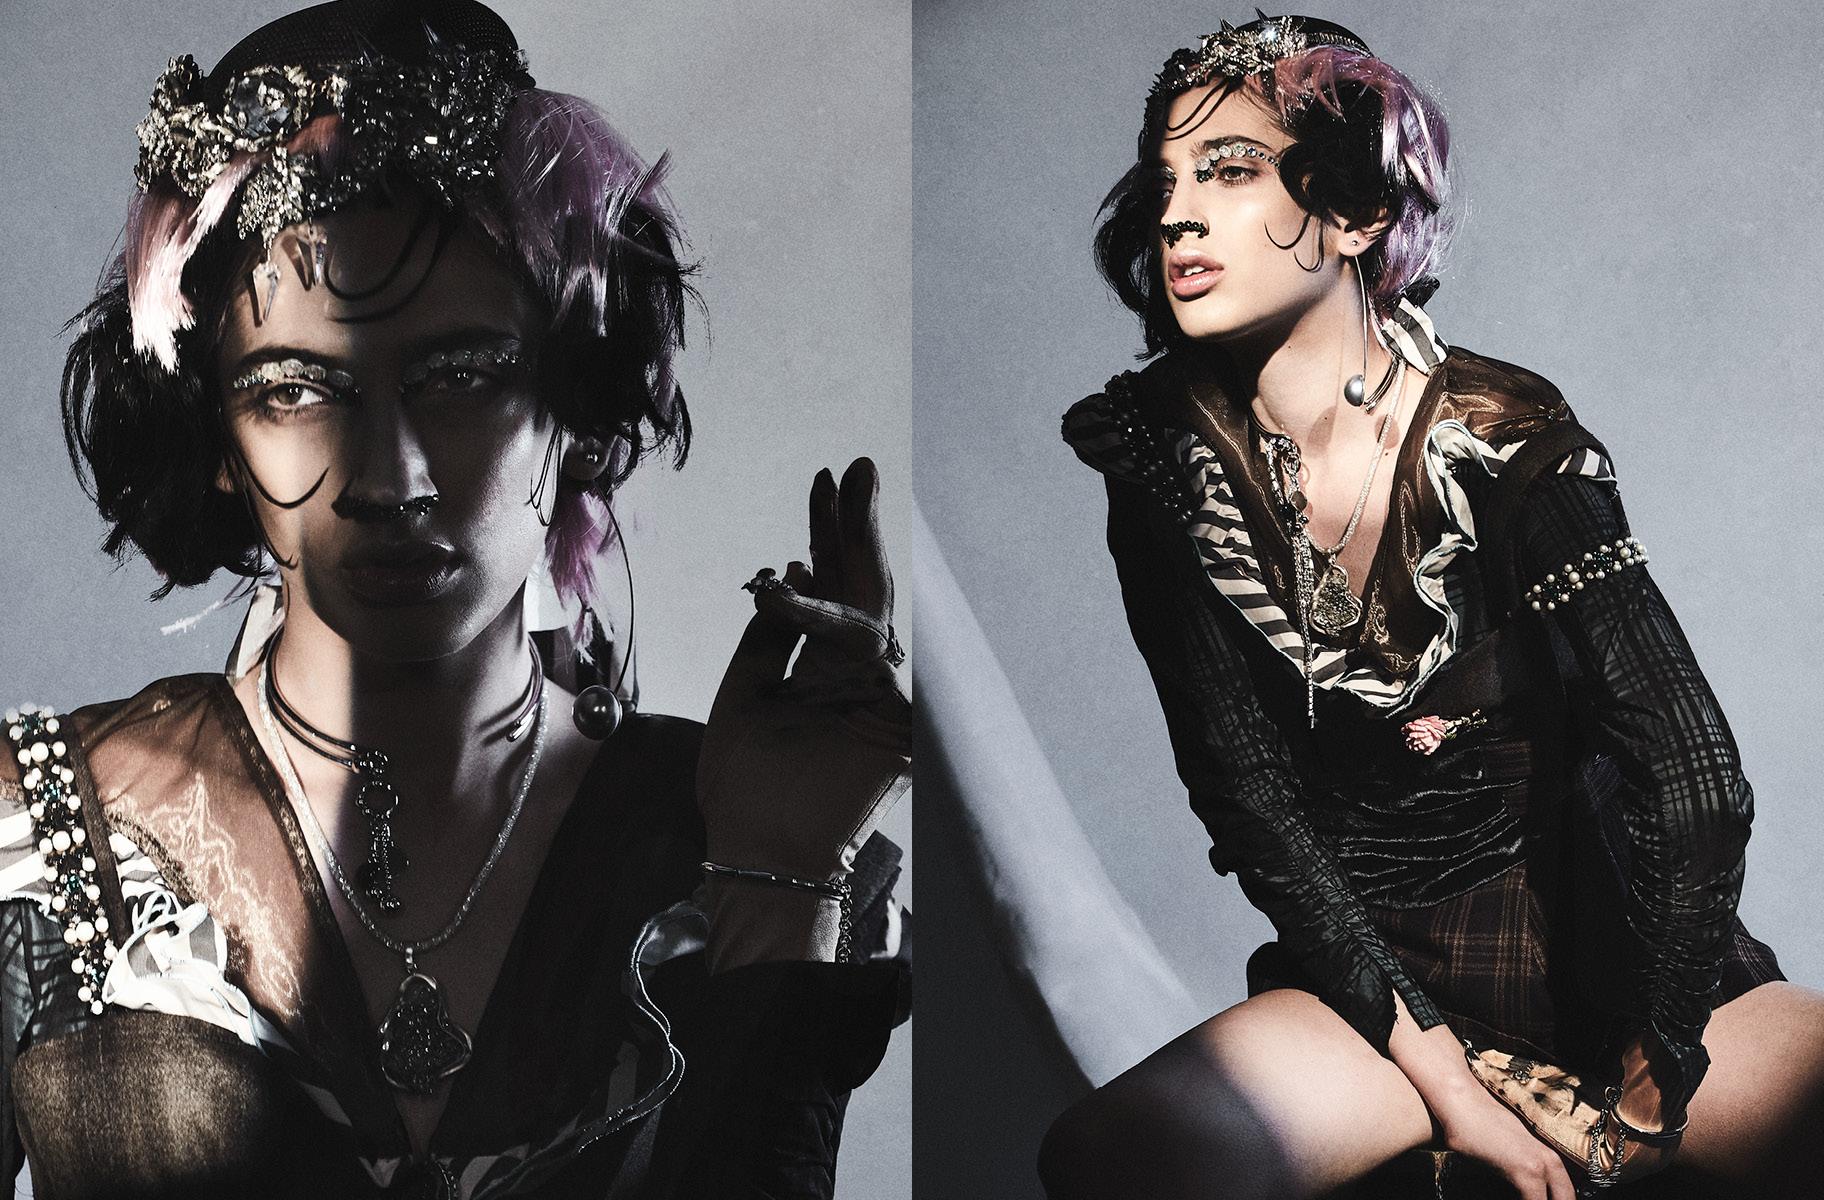 Spirit-&-Flesh-Magazine_THE-UNBEARABLE-BRIGHTNESS-OF-BEING_by_Evan-Lee_8